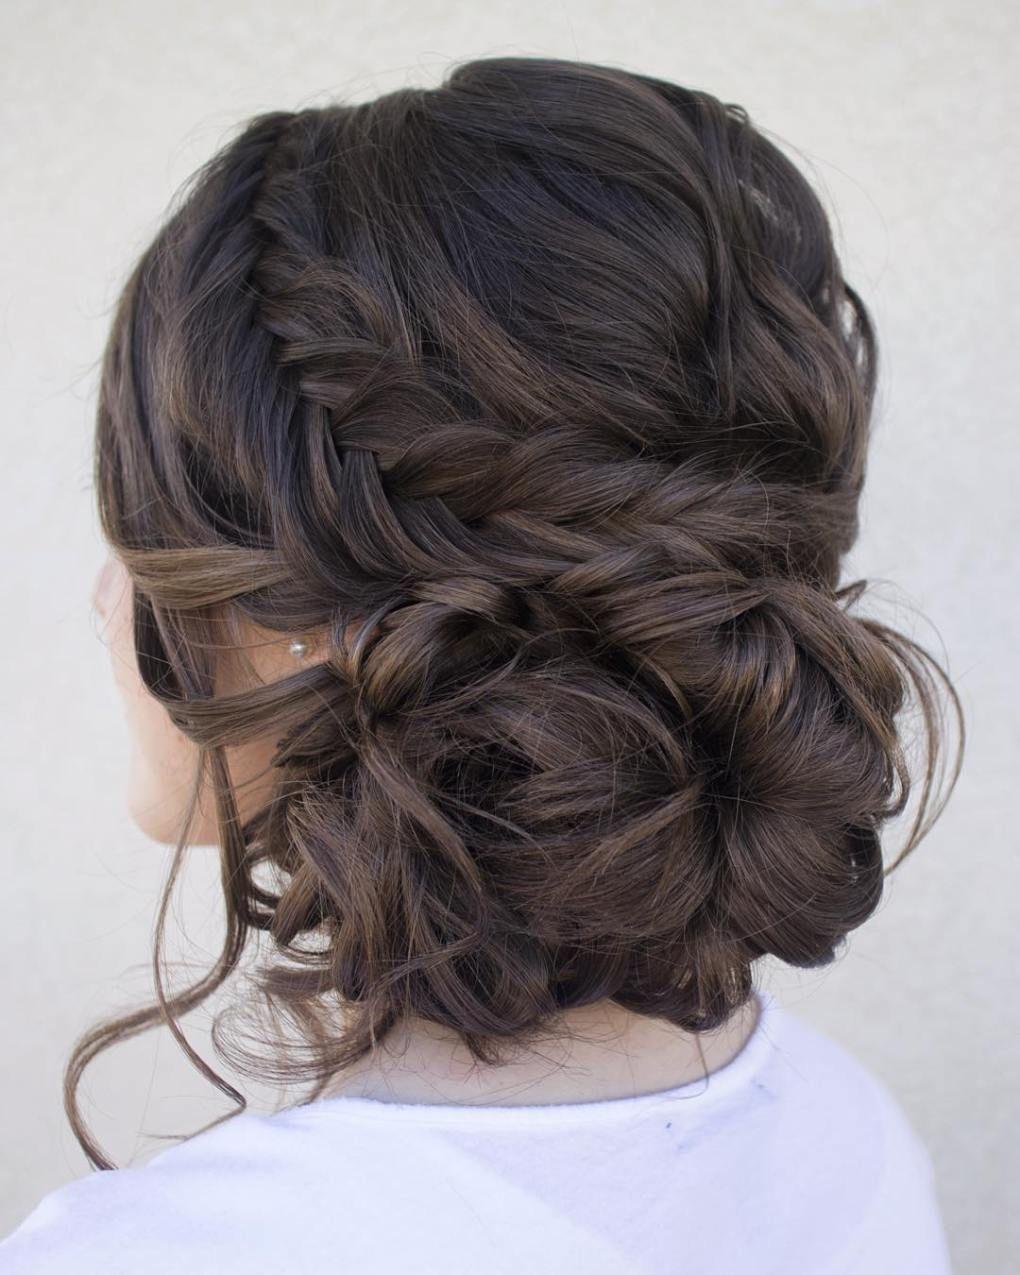 Forum on this topic: WEDDING DAY HAIR: ELEGANT FISHTAIL BUN HOW , wedding-day-hair-elegant-fishtail-bun-how/